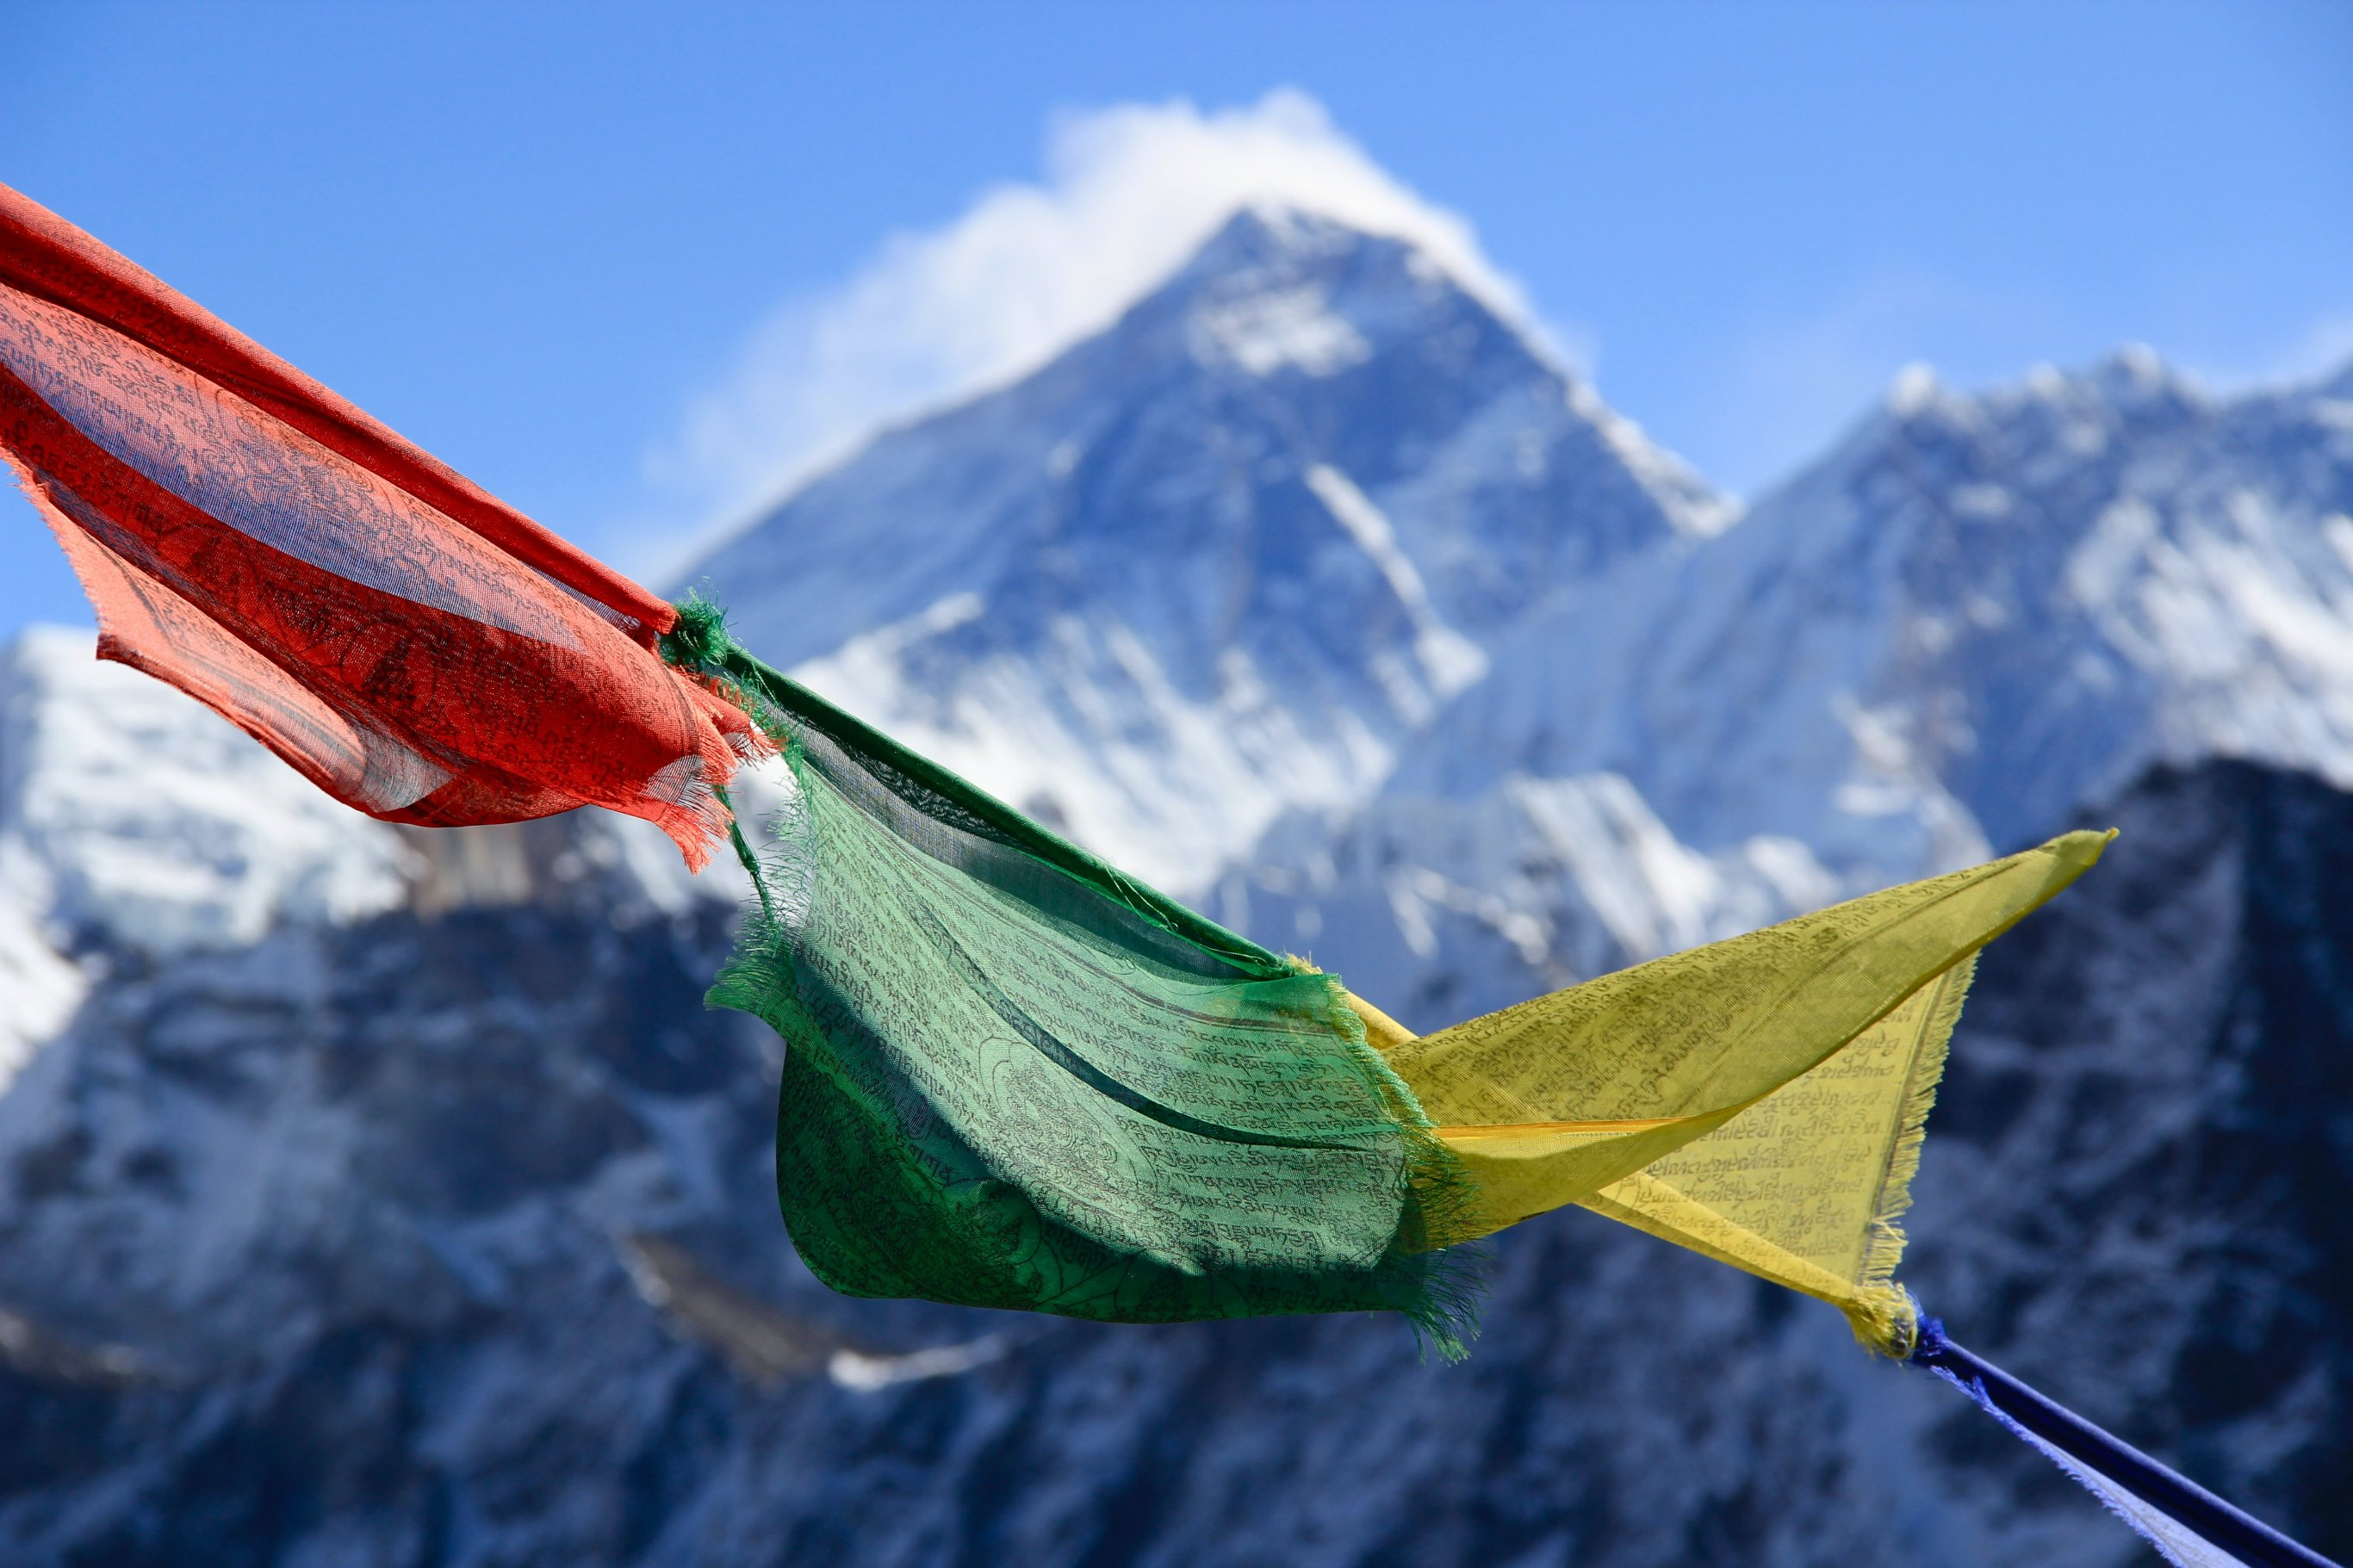 10-Day Everest View Trek & Kathmandu Sightseeing - Nepal Itinerary